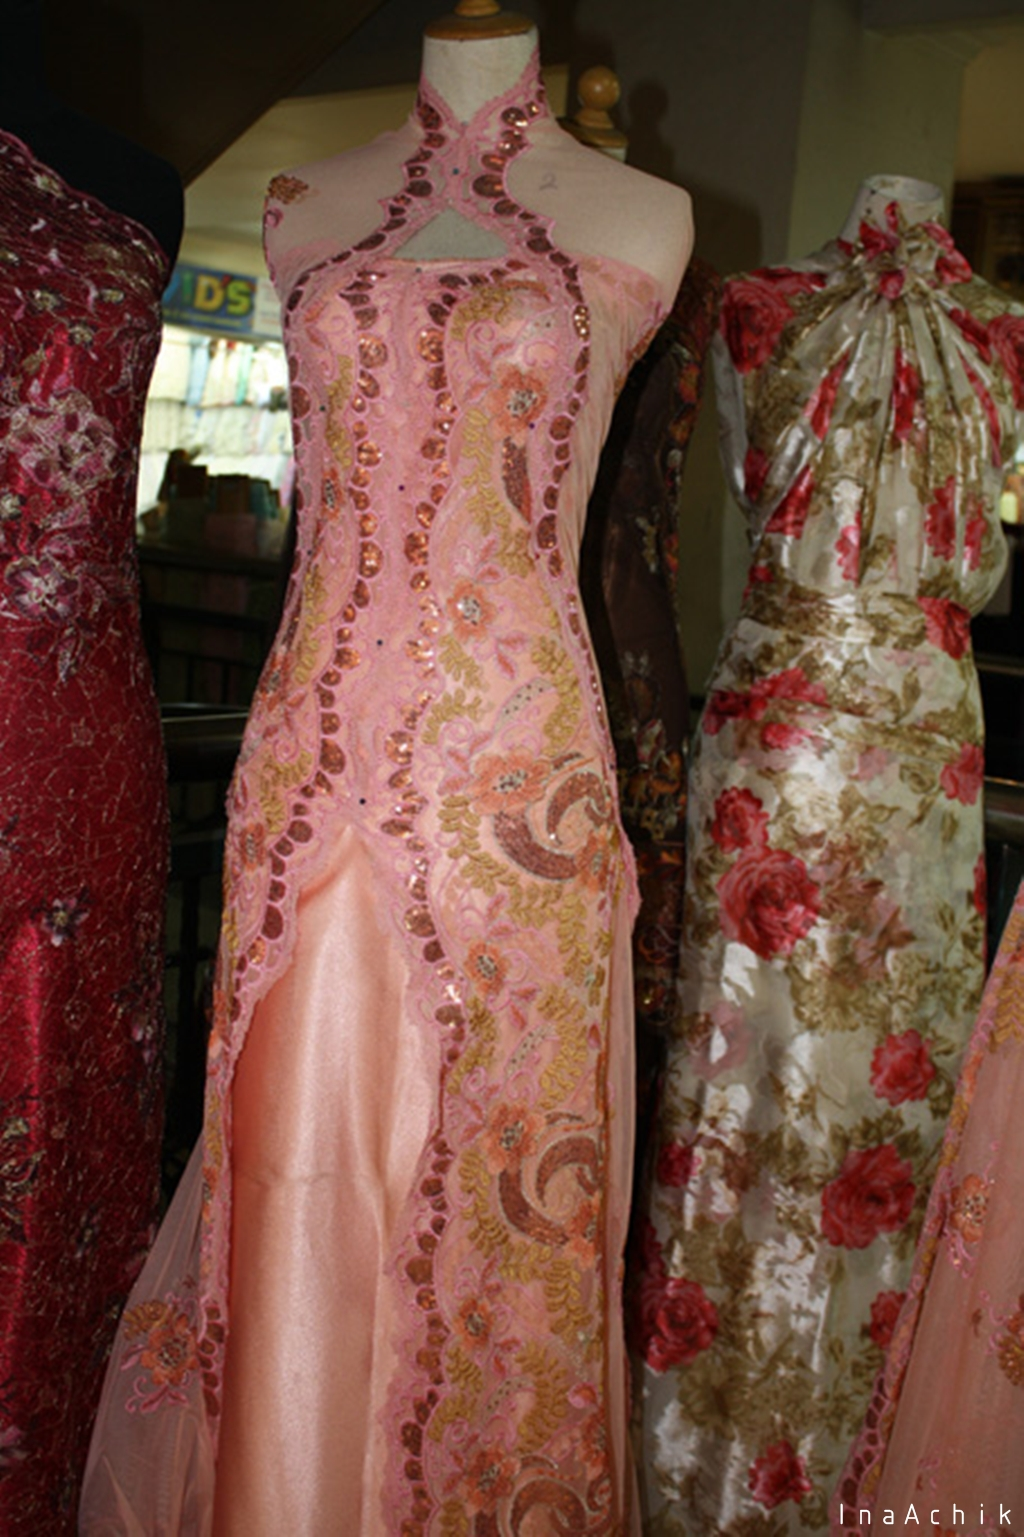 Kakikusukaberjalan pasar baru bandung Baju gamis pasar baru bandung